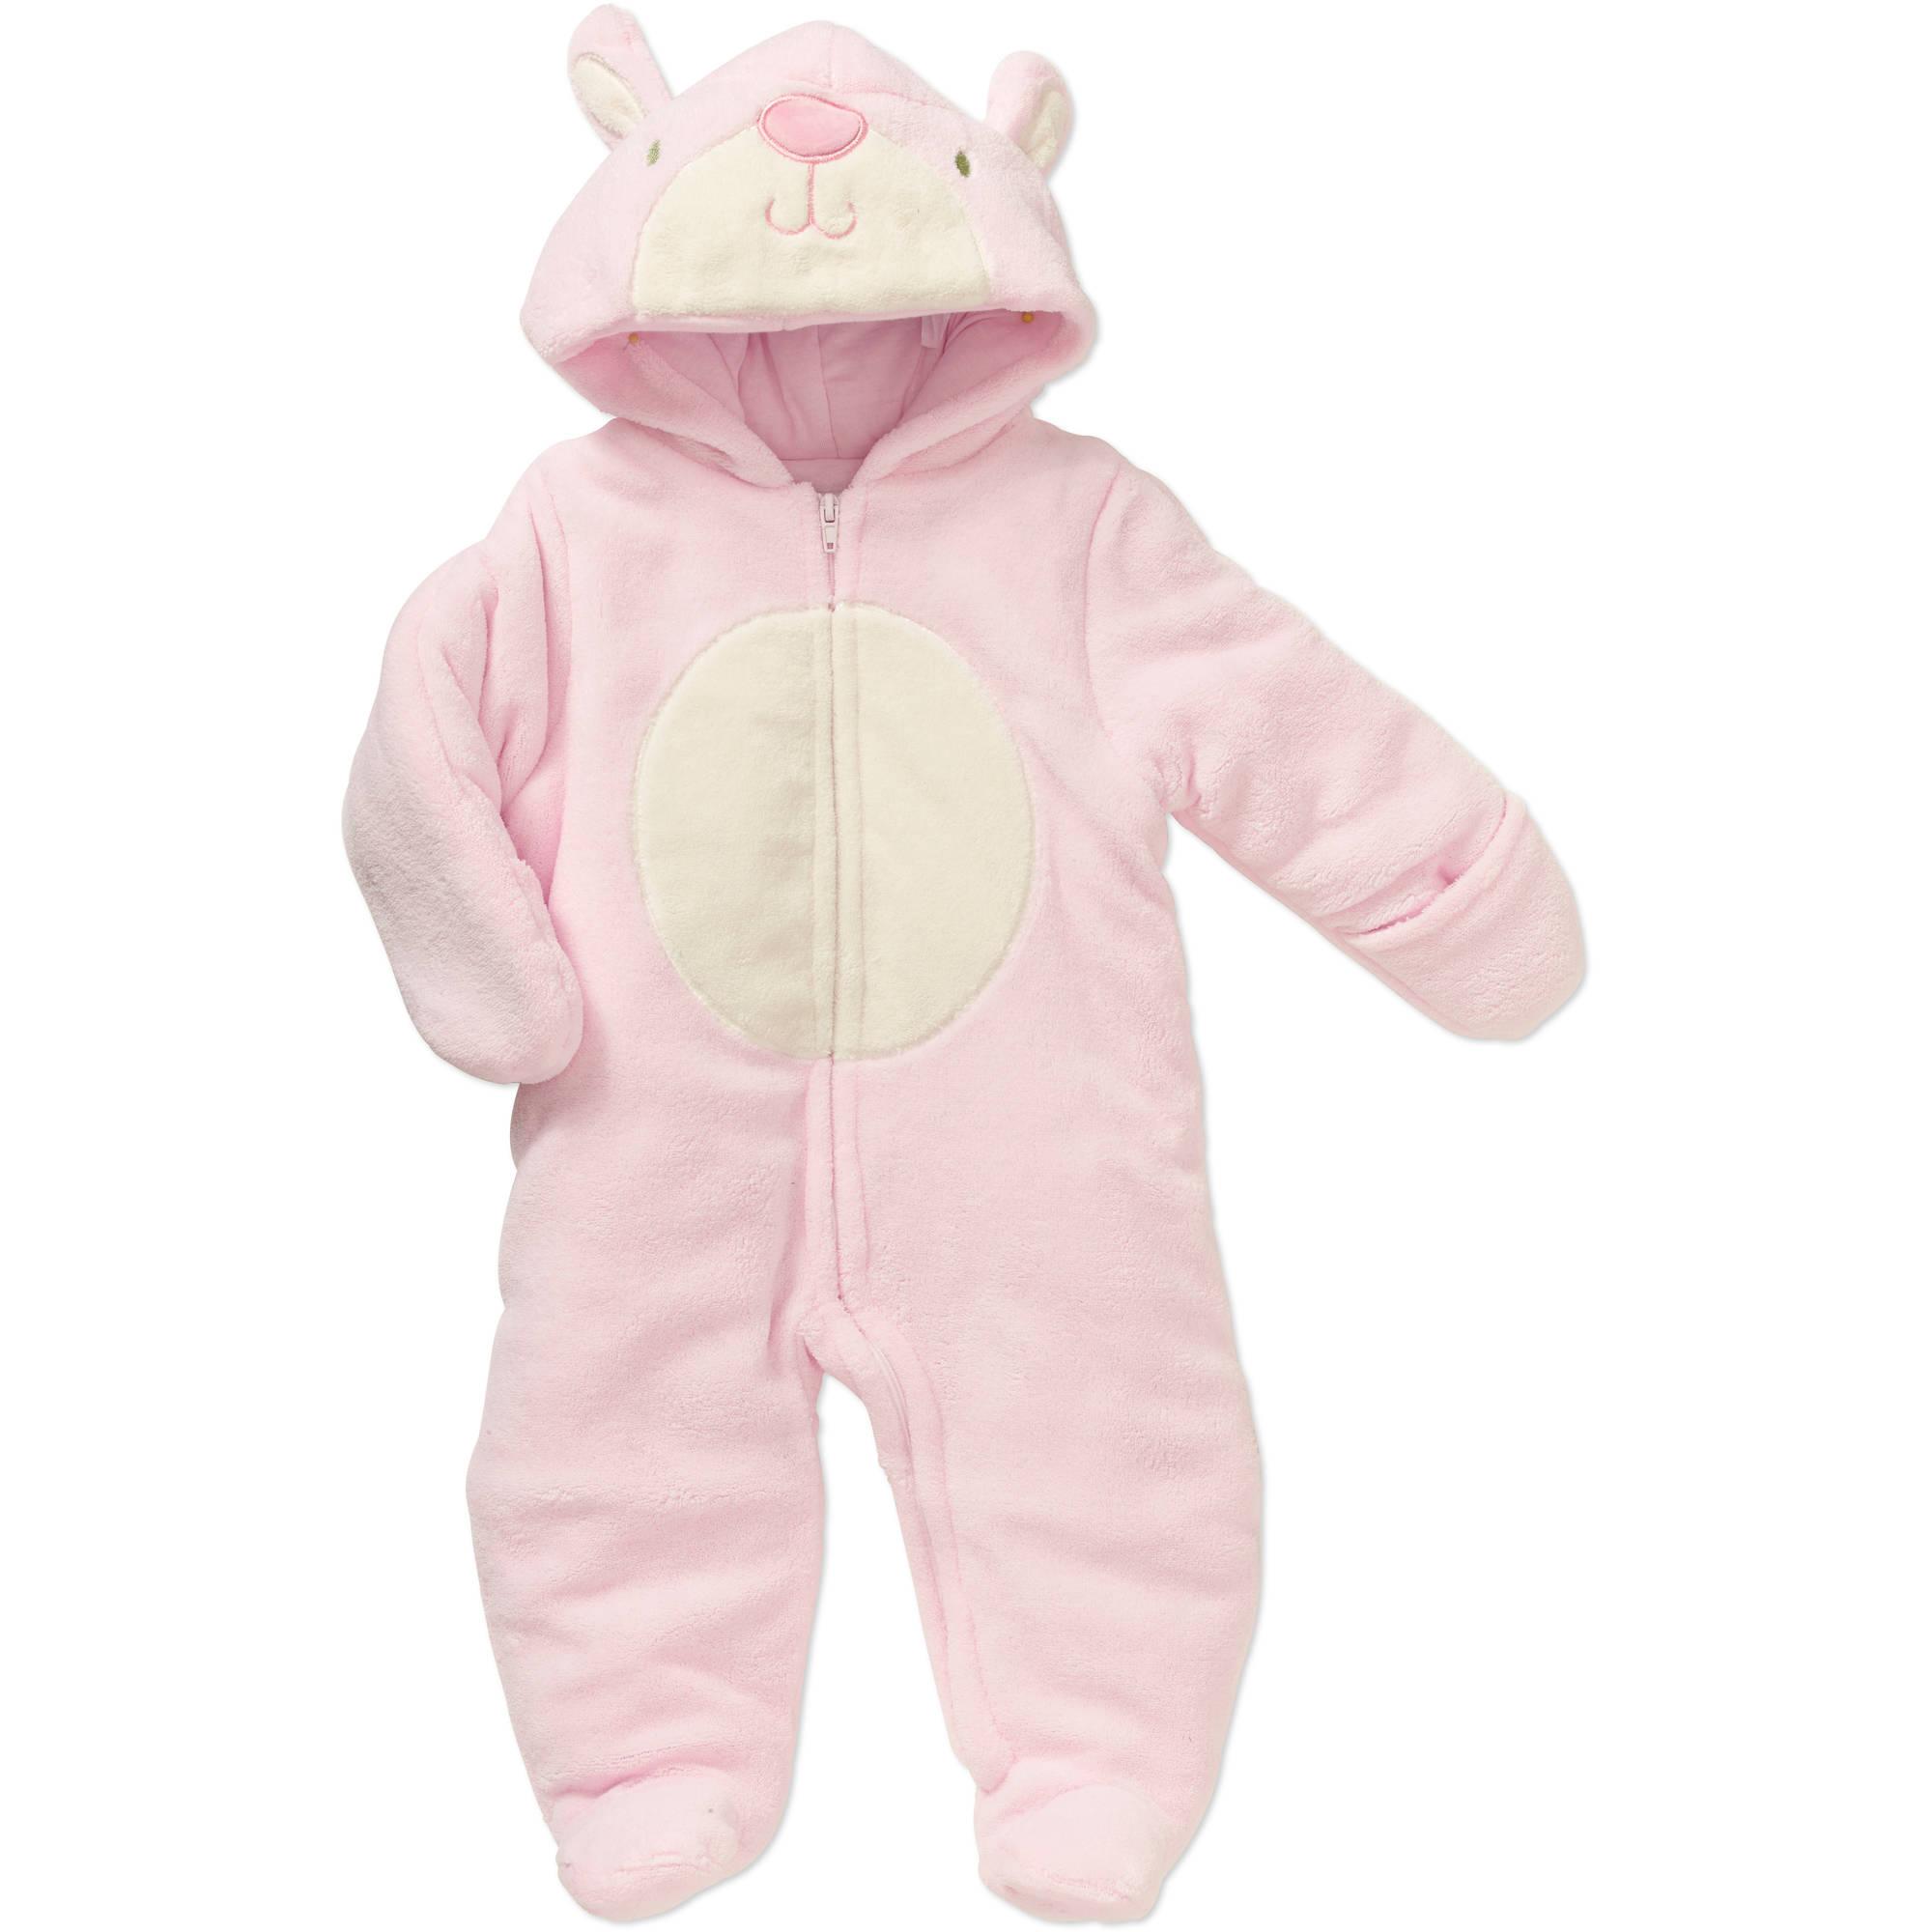 Quiltex Newborn Baby Girls' Fleece Bunny Pram